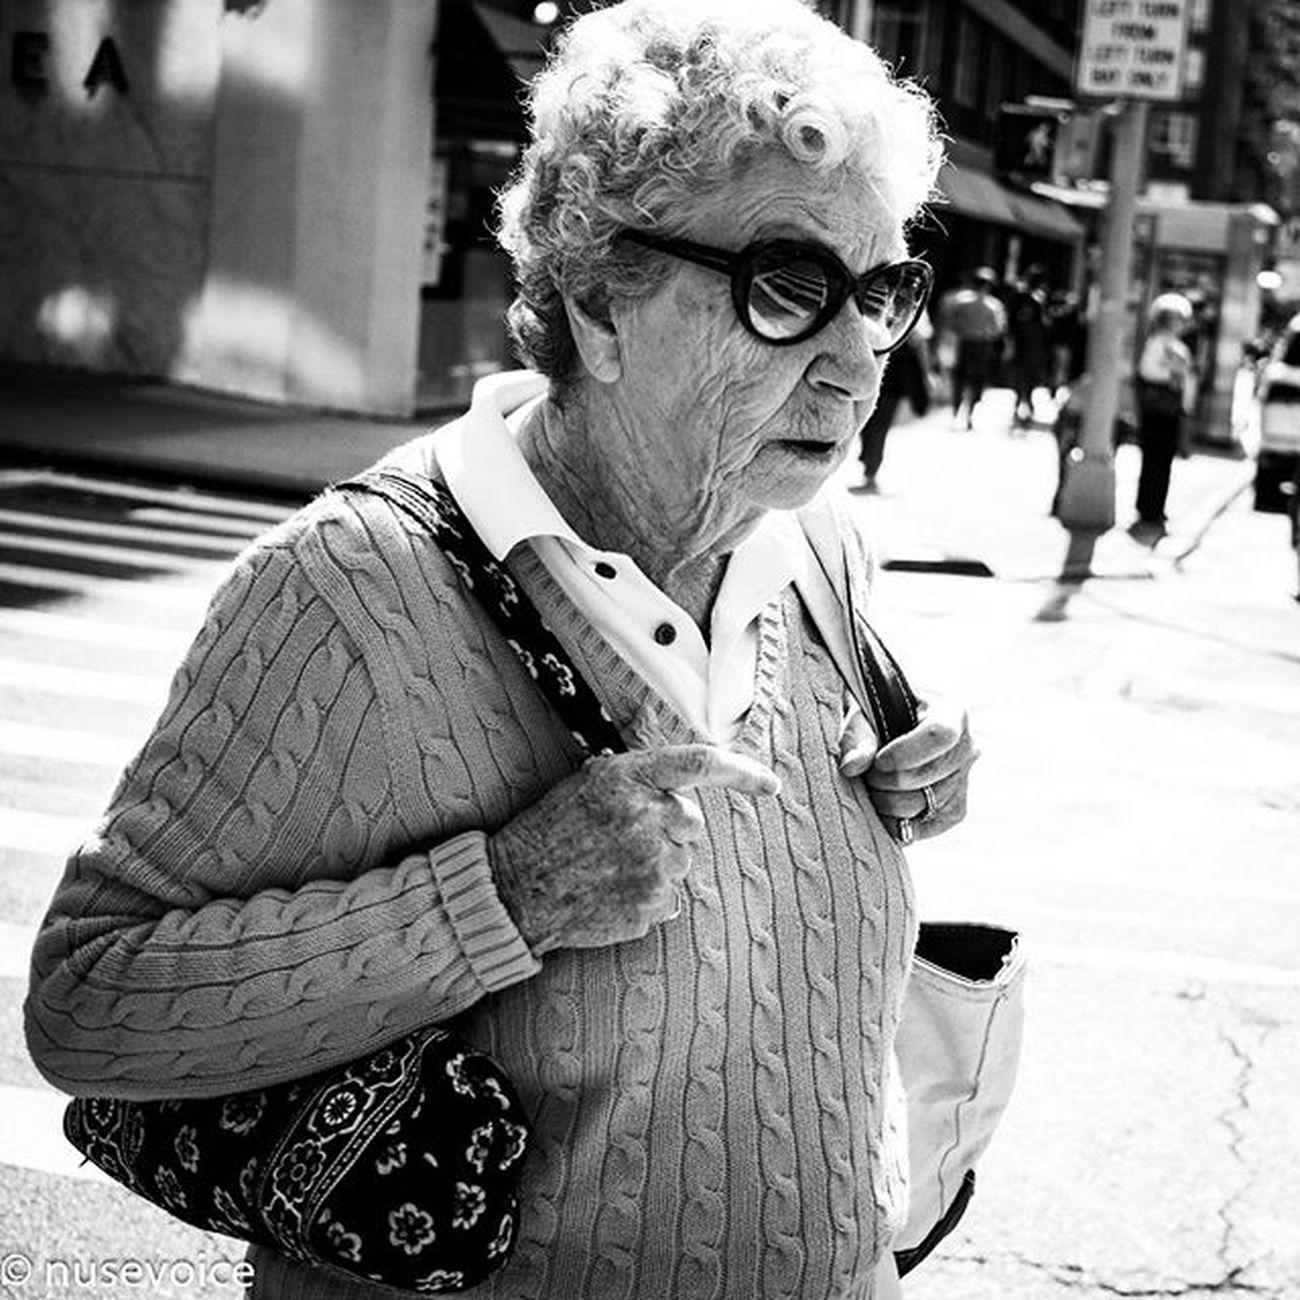 Grandma's Day Out • September 2015 Nusevoice Olympusomdem1 Zuikodigital Instagoodmyphotos instagram wsp instagoodmyphoto instagood instagrammersgallery blackandwhitephotography blackandwhite streetphotography streetphotography_bw lady woman maturelady sunshine chelseanyc downtownnyc manhattan NYC bnwlife bnw_society senior igers perfect_bnw gallery_of_bnw gallery_of_bw